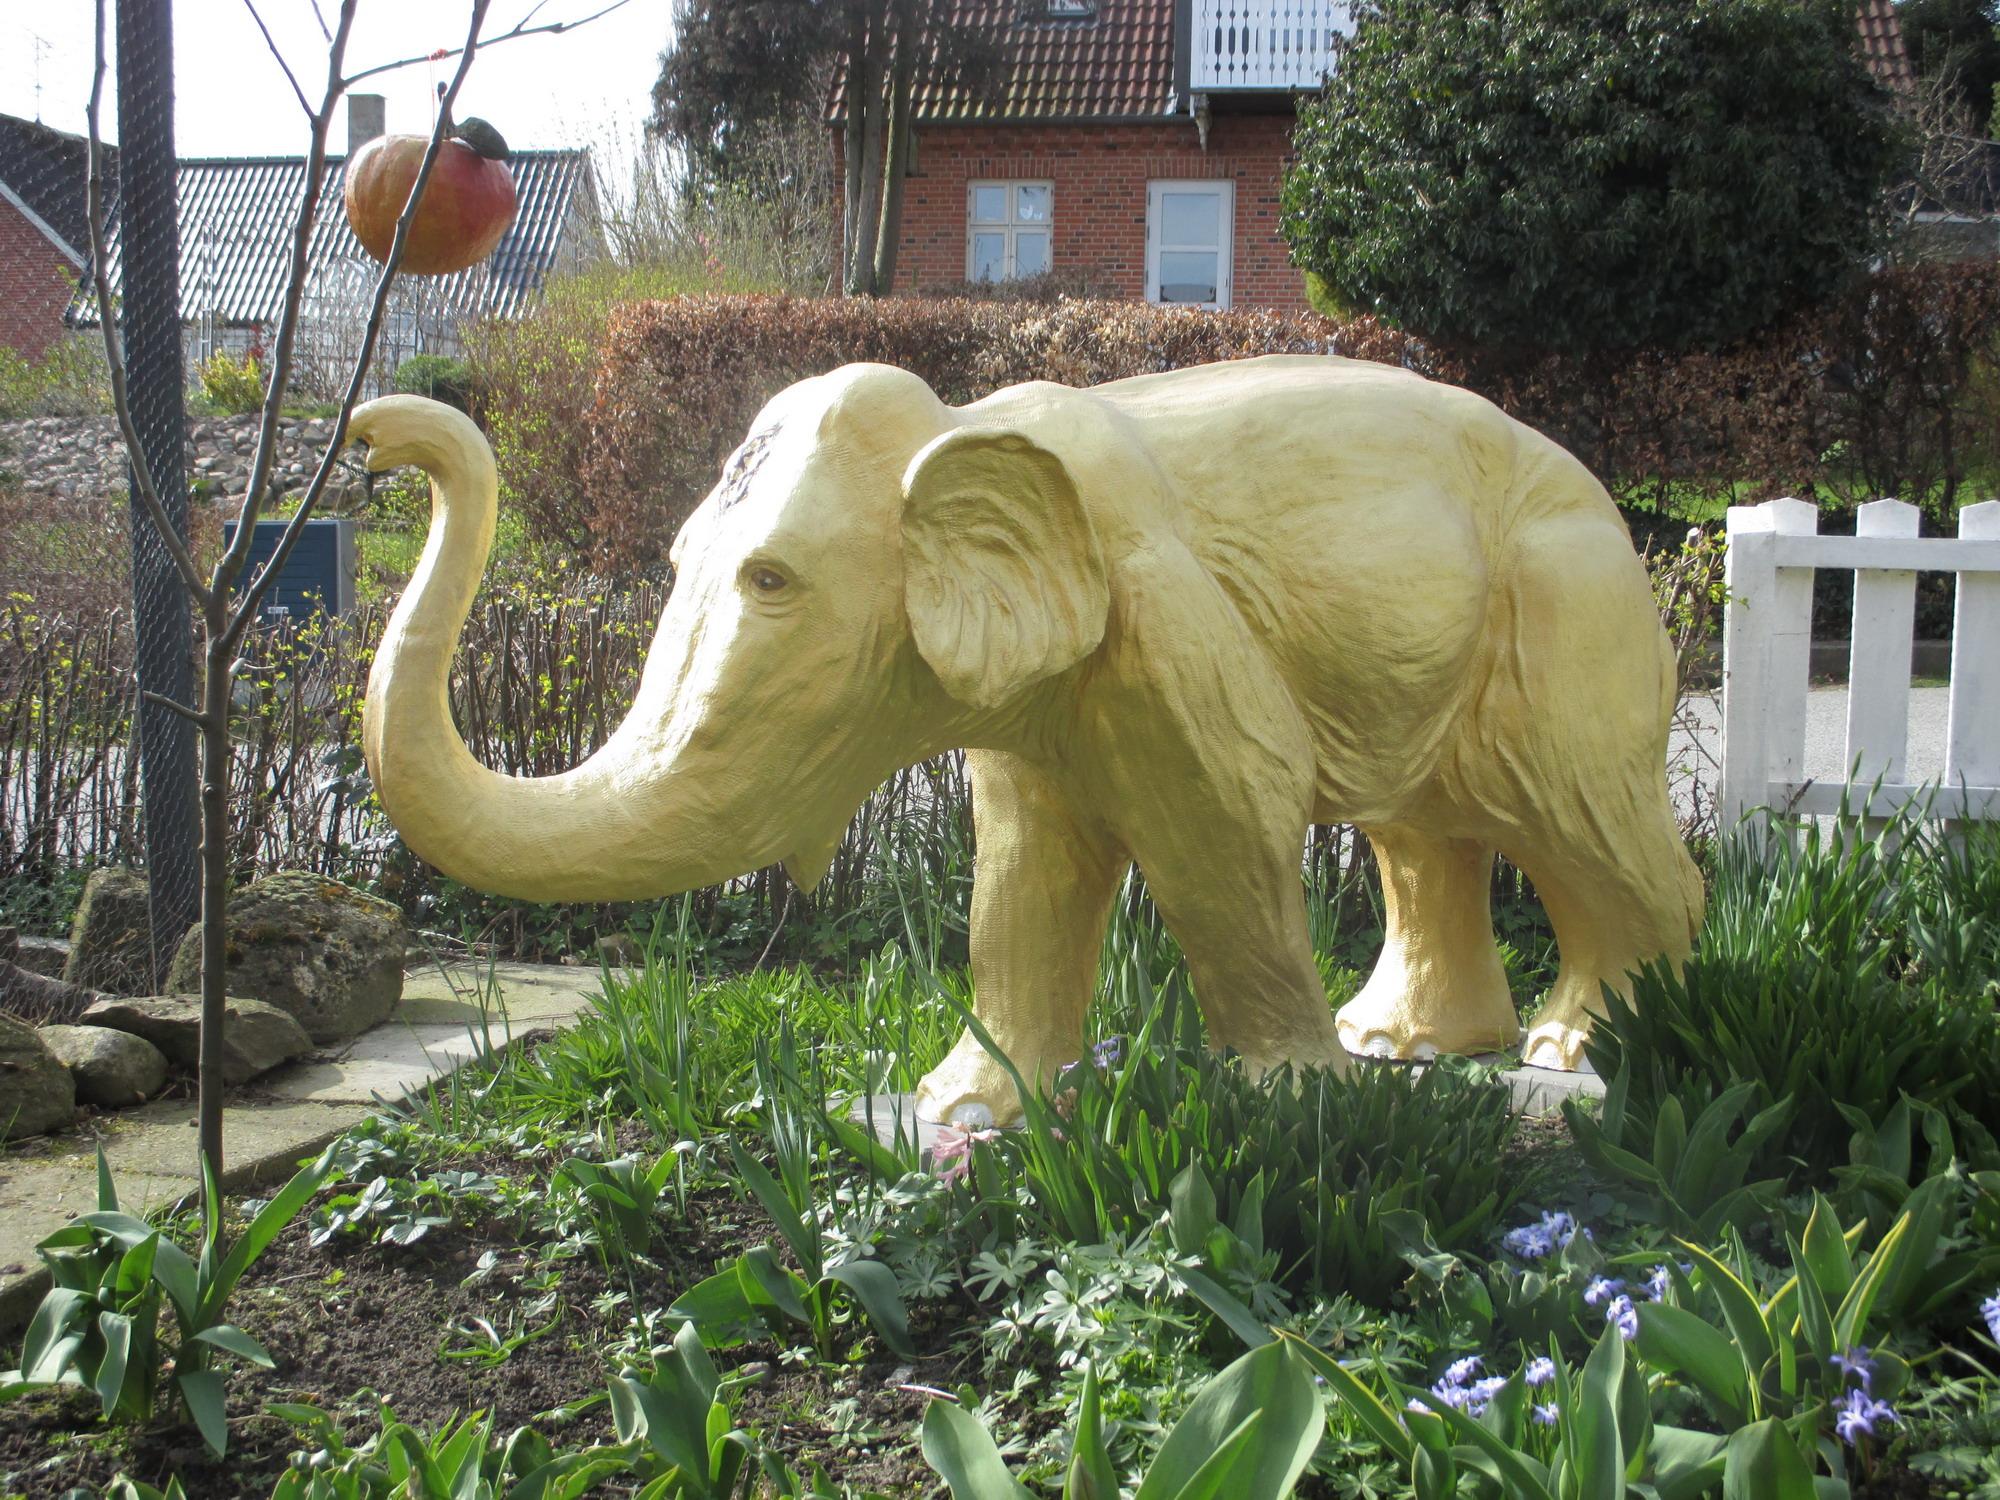 The One Dollar Dream - den gyldne elefant i Gl. Rye/the golden elephant in Gl. Rye